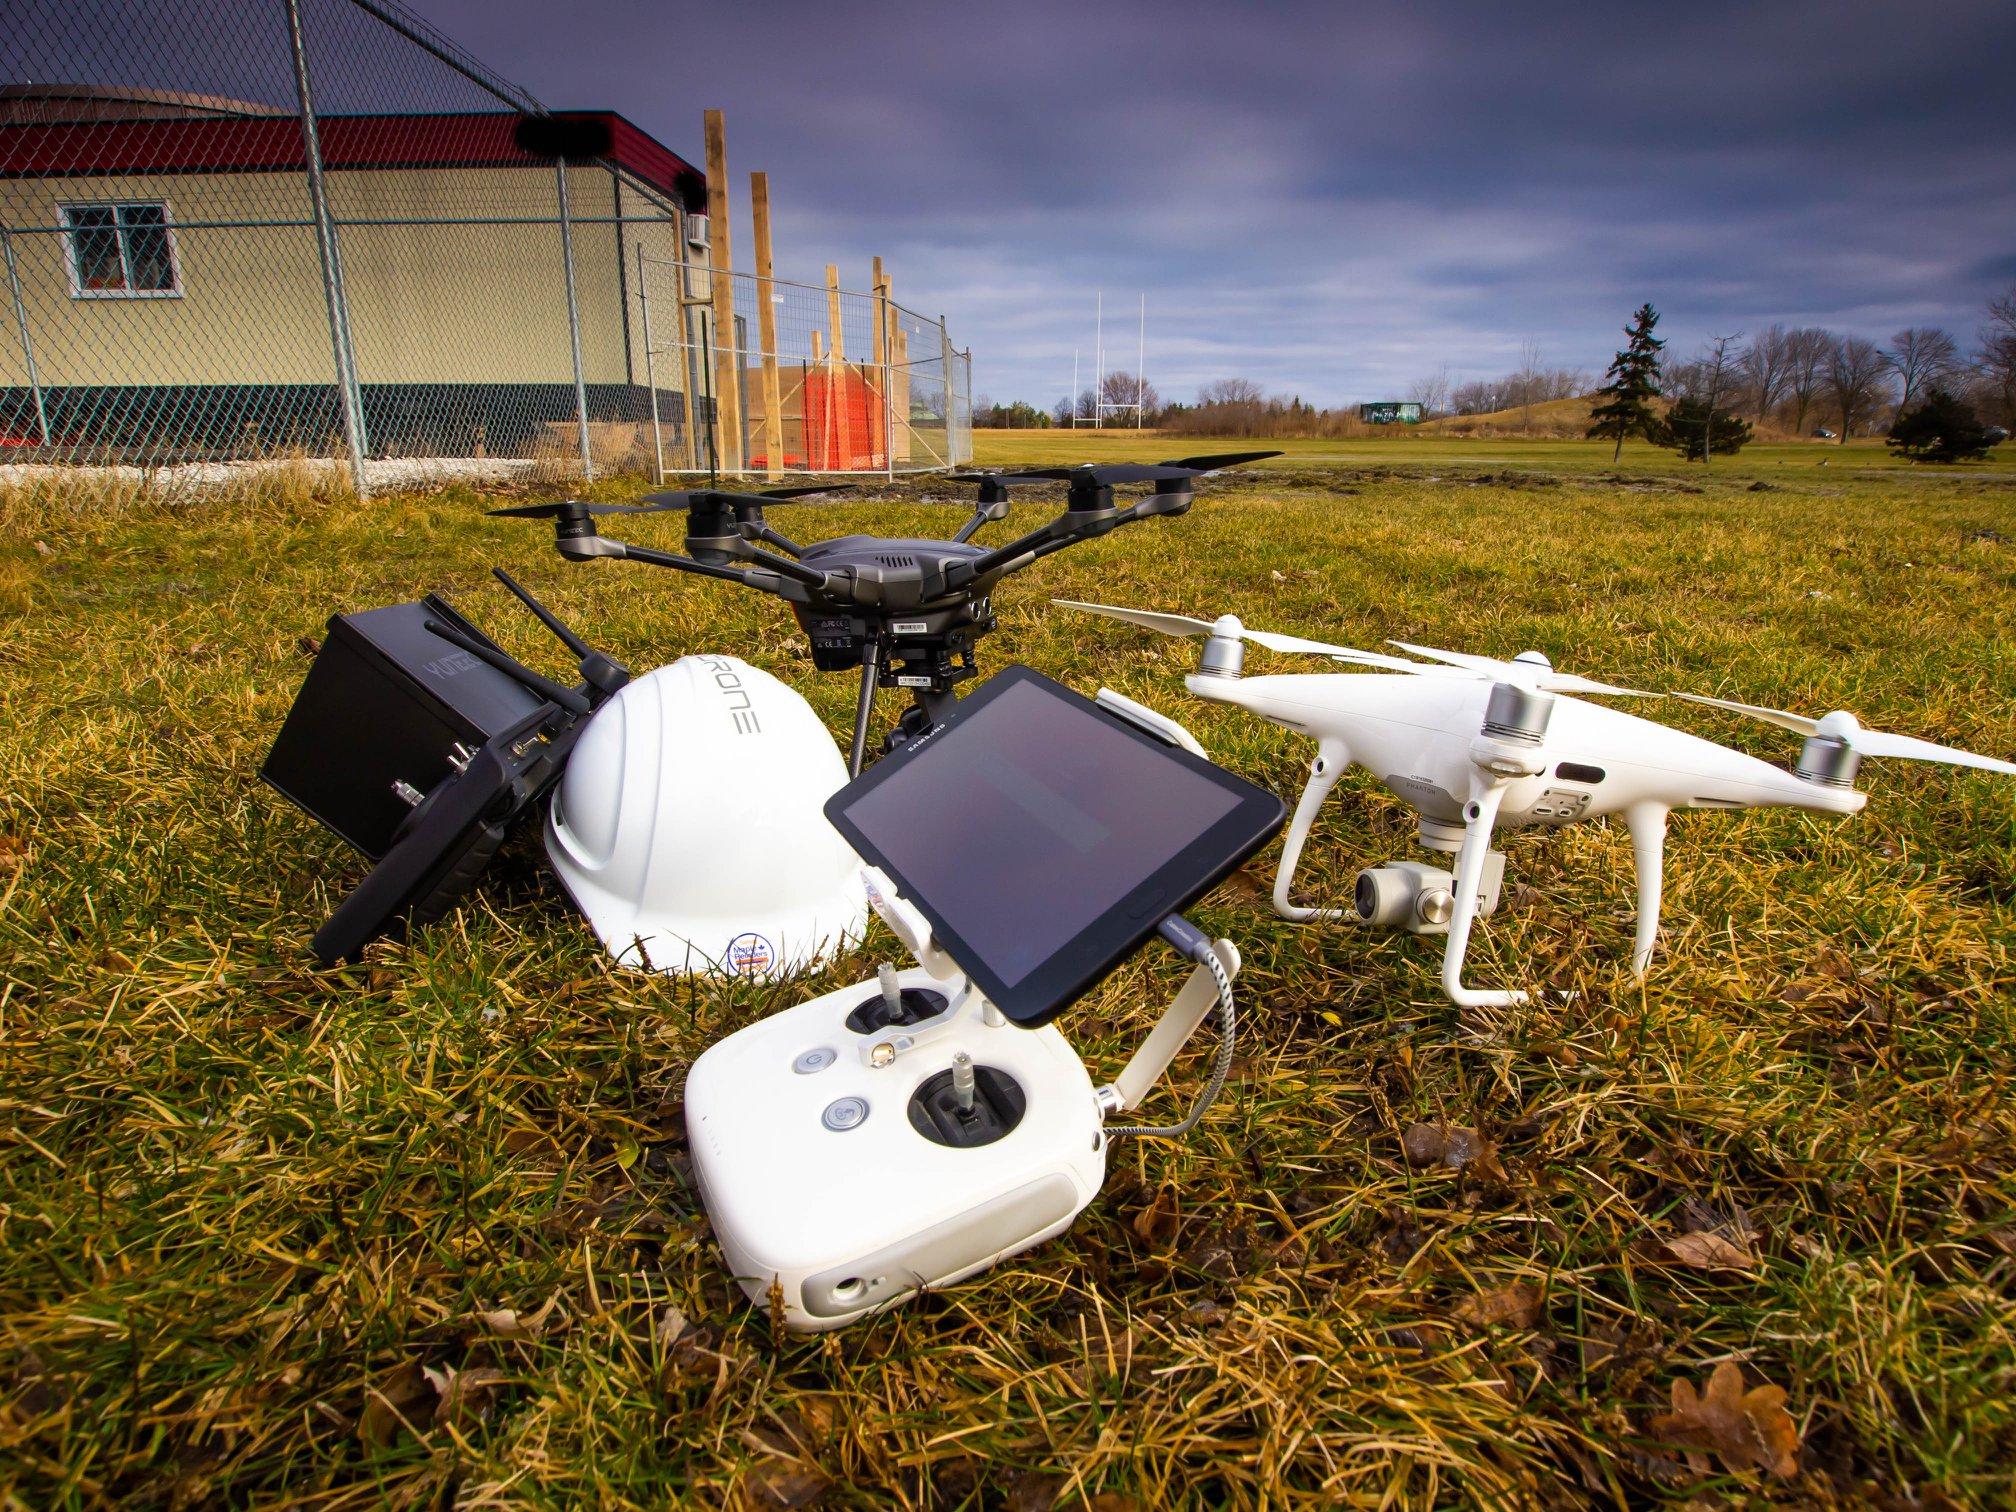 videodrone equipment on site